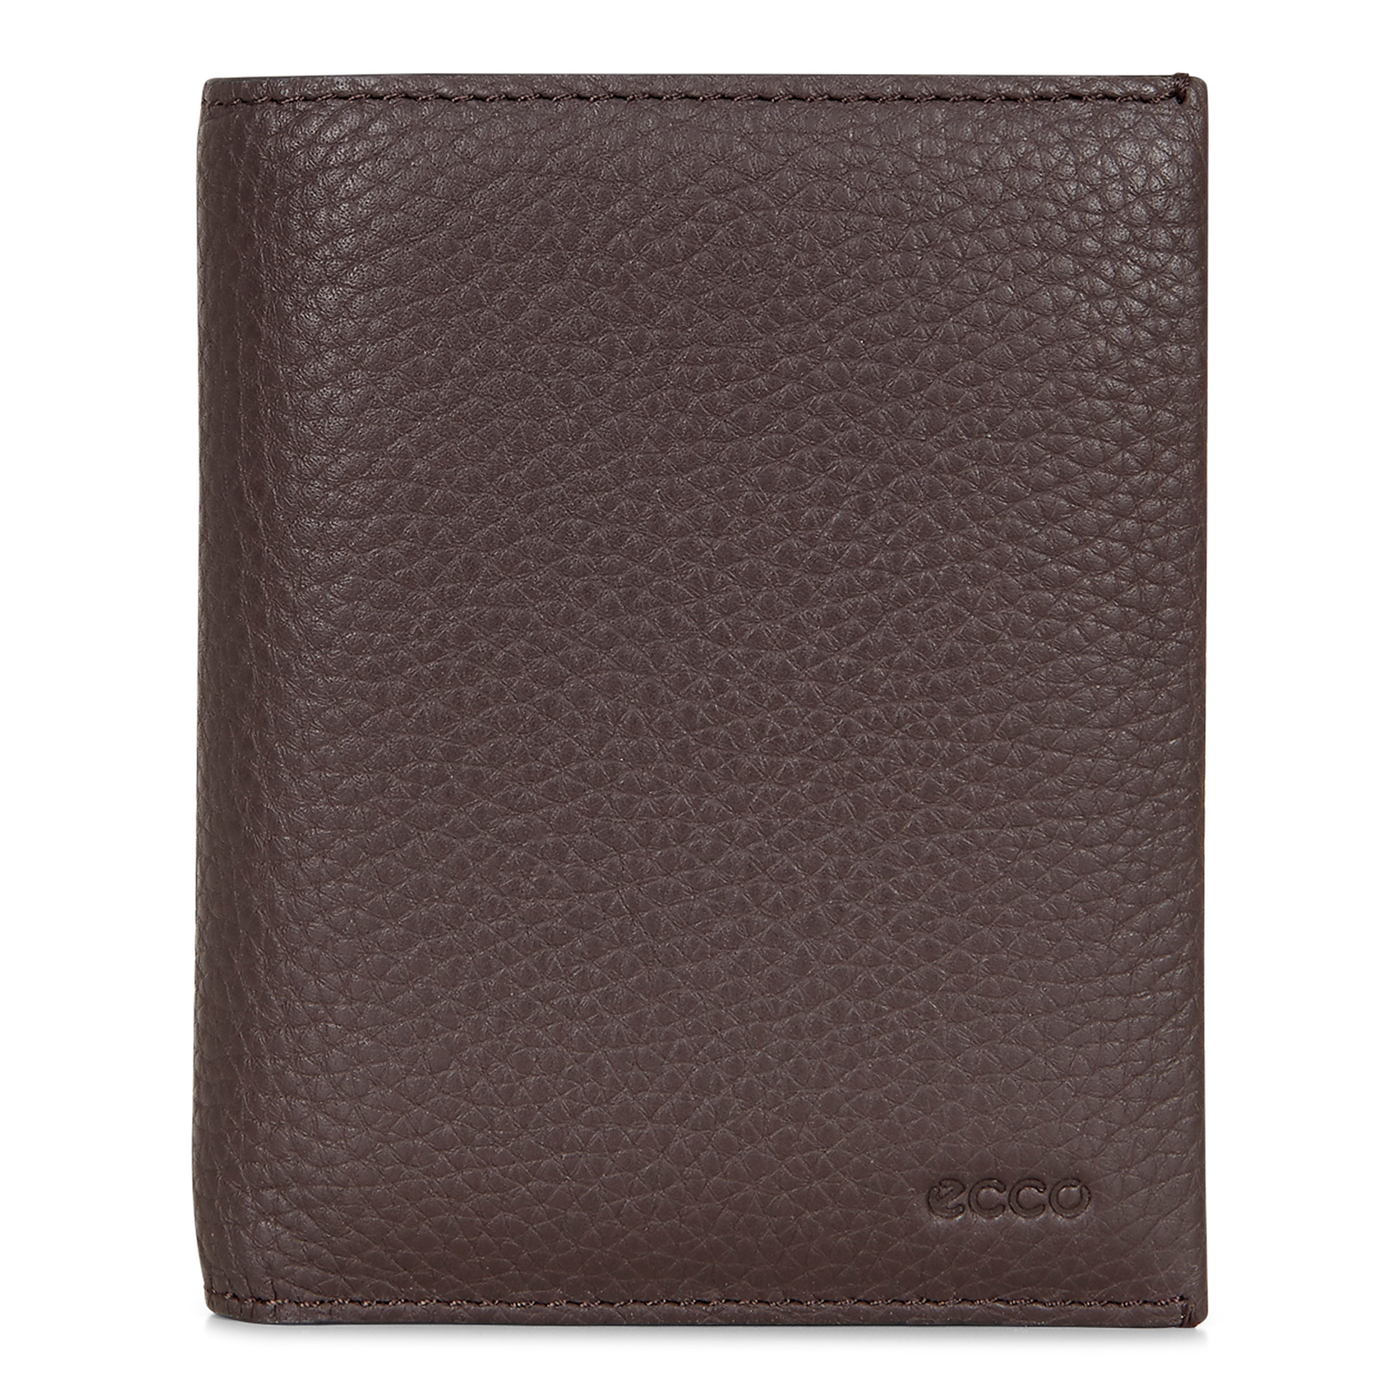 ECCO BJORN Classic Wallet RFID